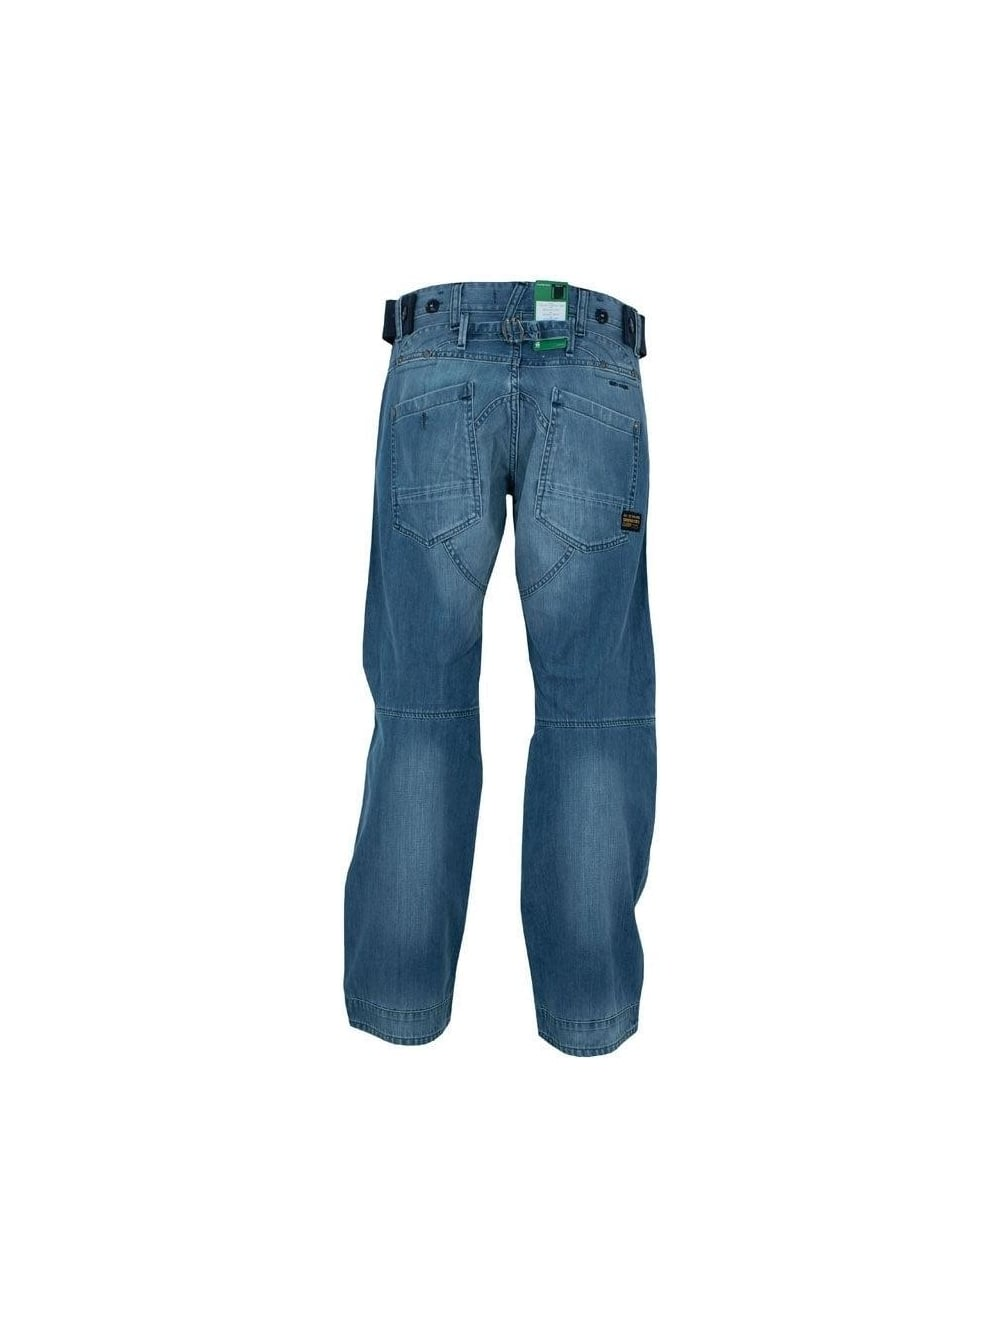 g star g star storm 5620 loose embro jean custom aged blue g star jeans at northern threads. Black Bedroom Furniture Sets. Home Design Ideas